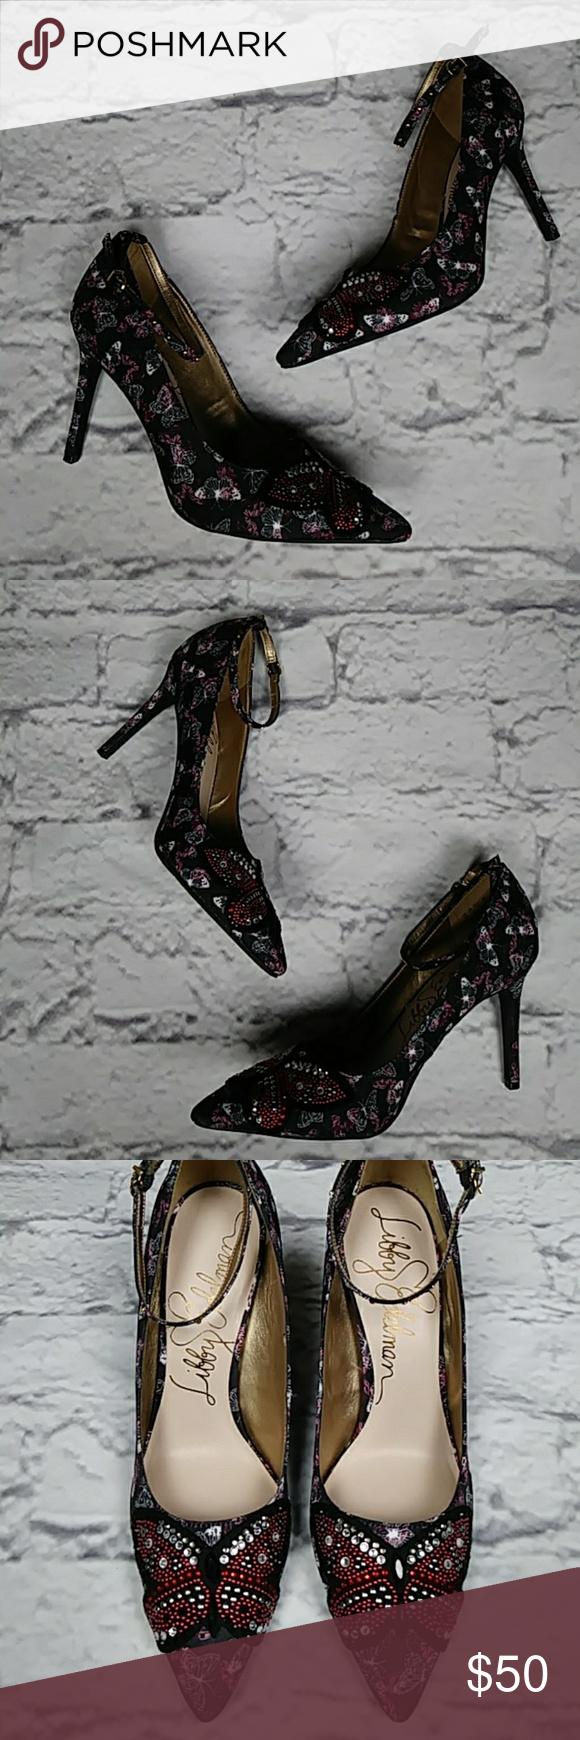 ac7989baf60c Libby edelman heel size 9 New no tags Libby eddelman heel Size 9 libby.  edelman Shoes Heels